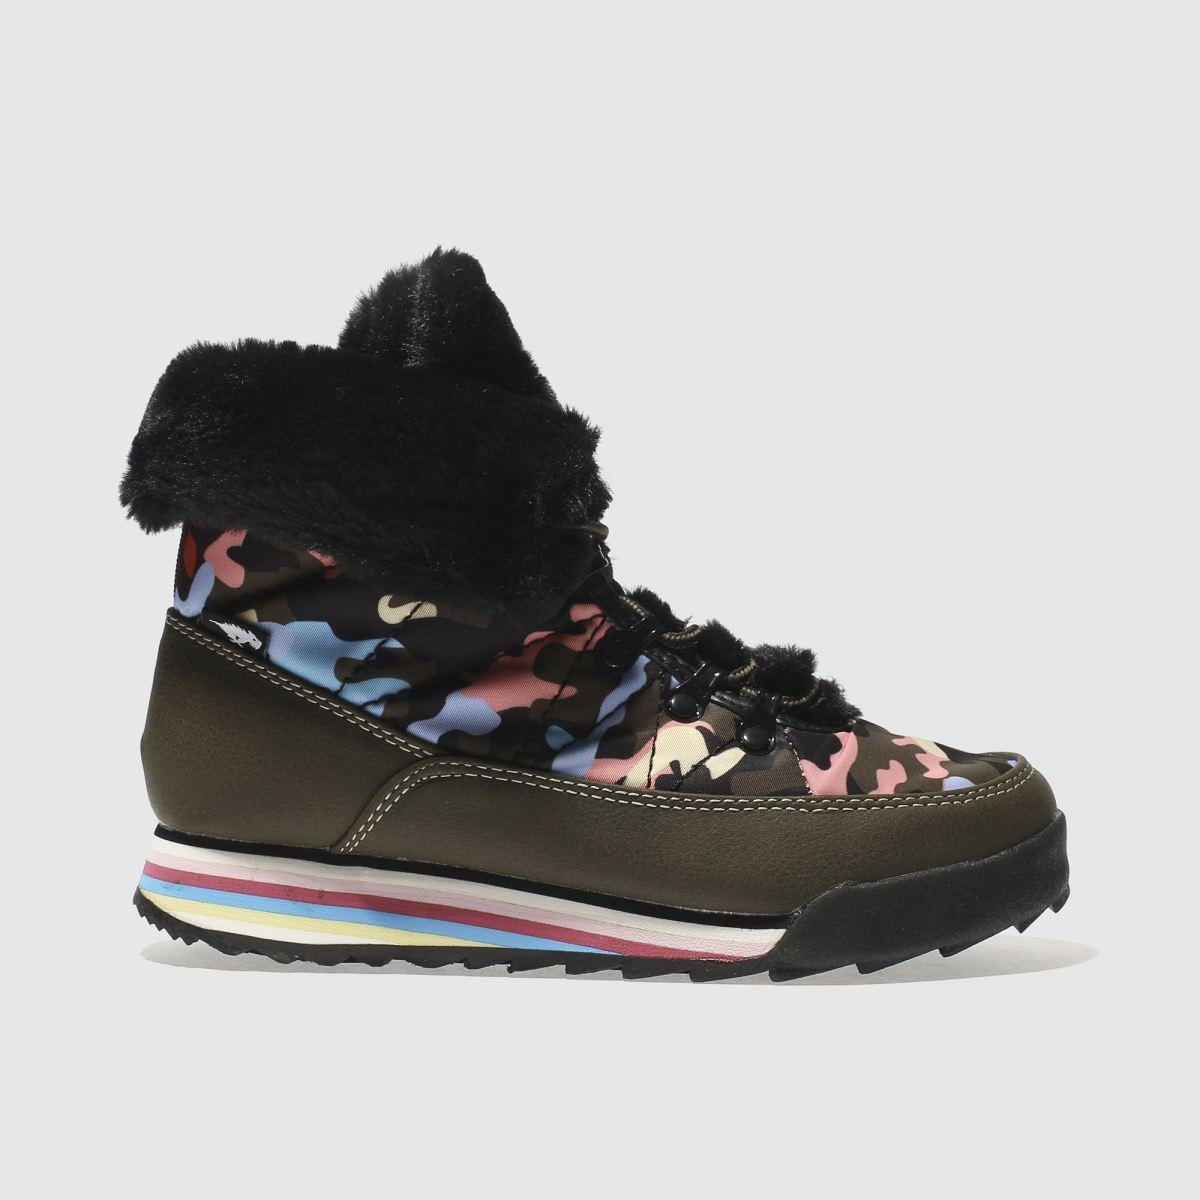 rocket dog khaki icee candy camo boots